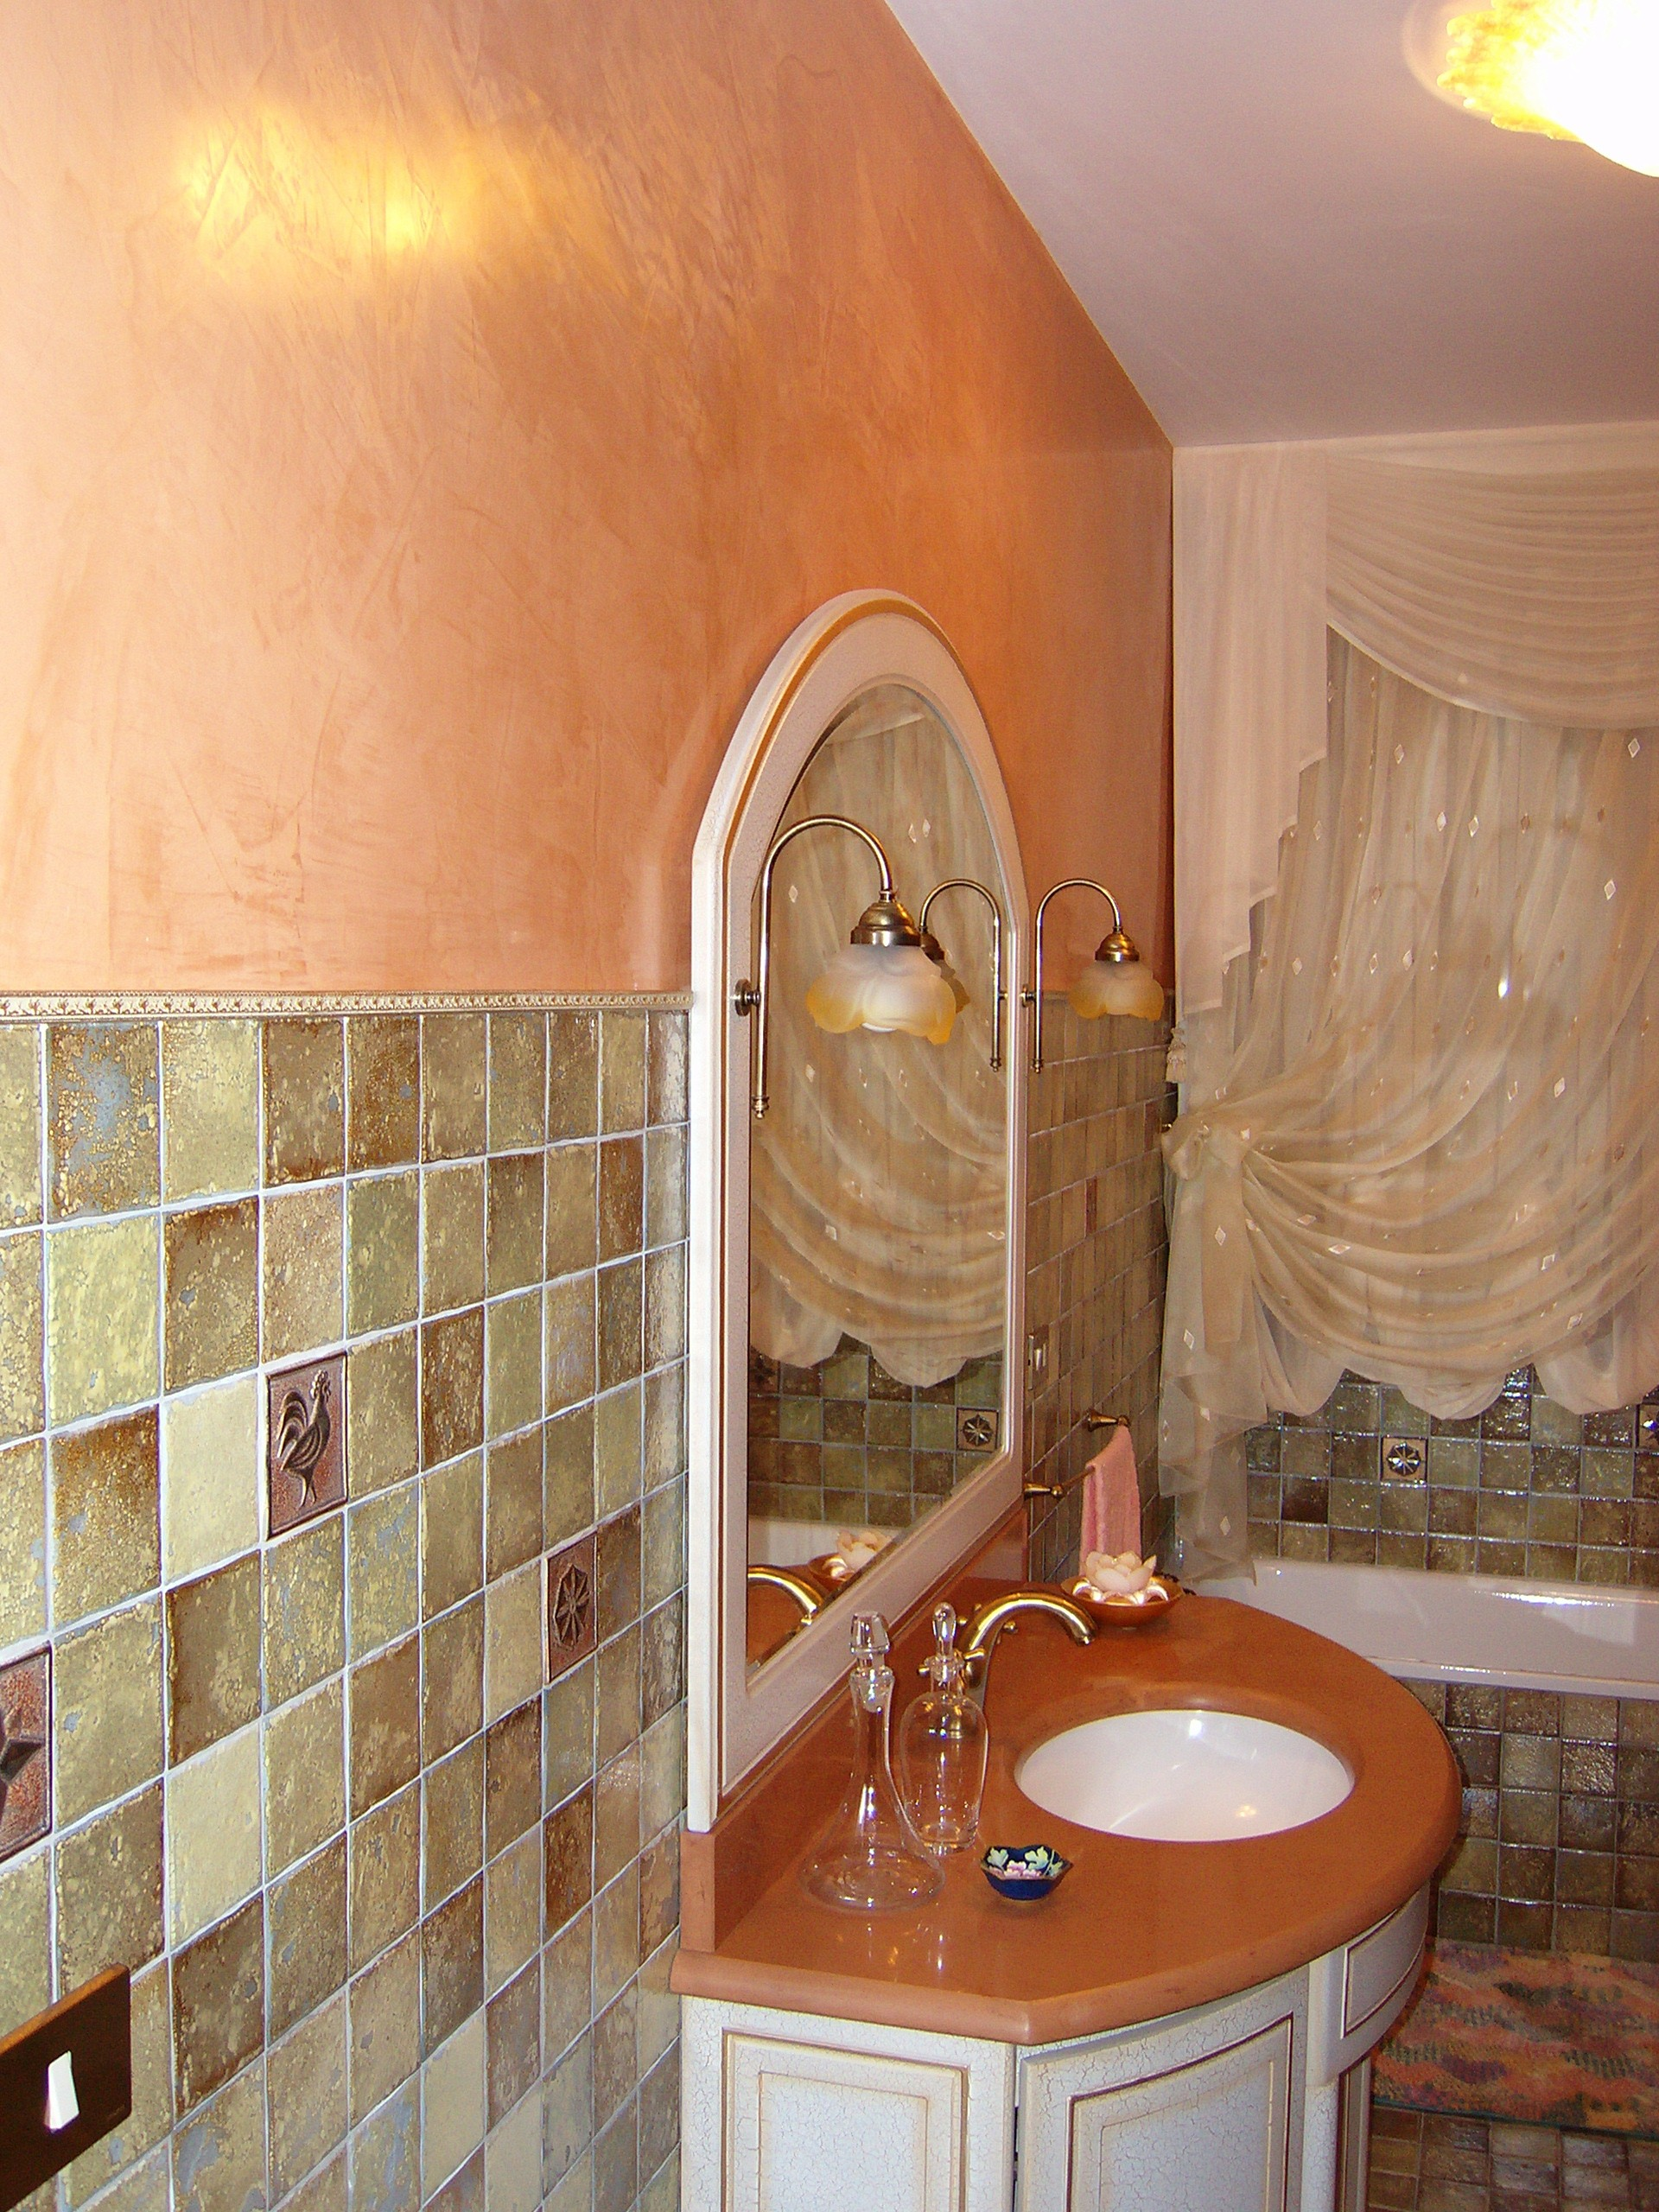 Photos - Stucco veneziano bagno ...